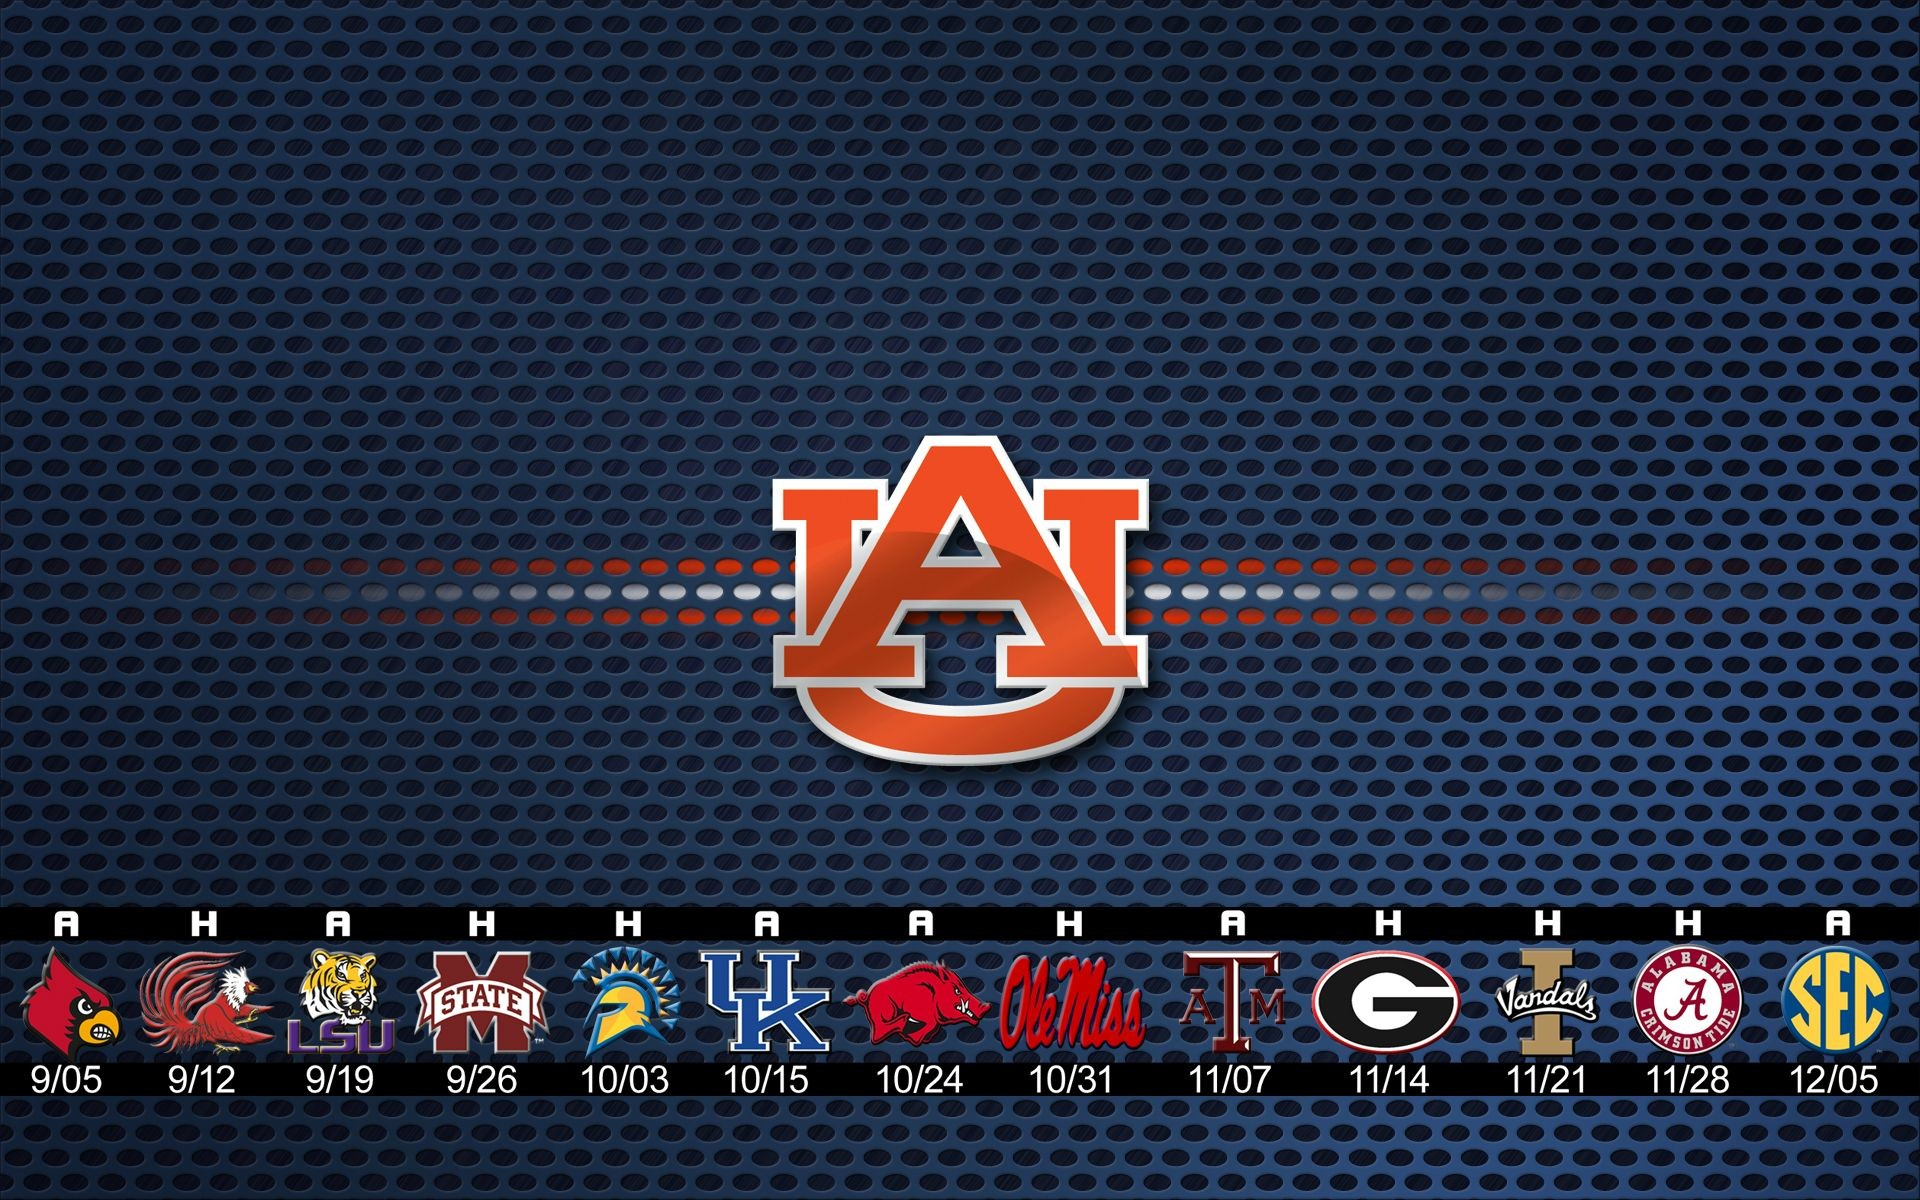 Auburn Tigers Football 2015 Schedule Wallpaper …